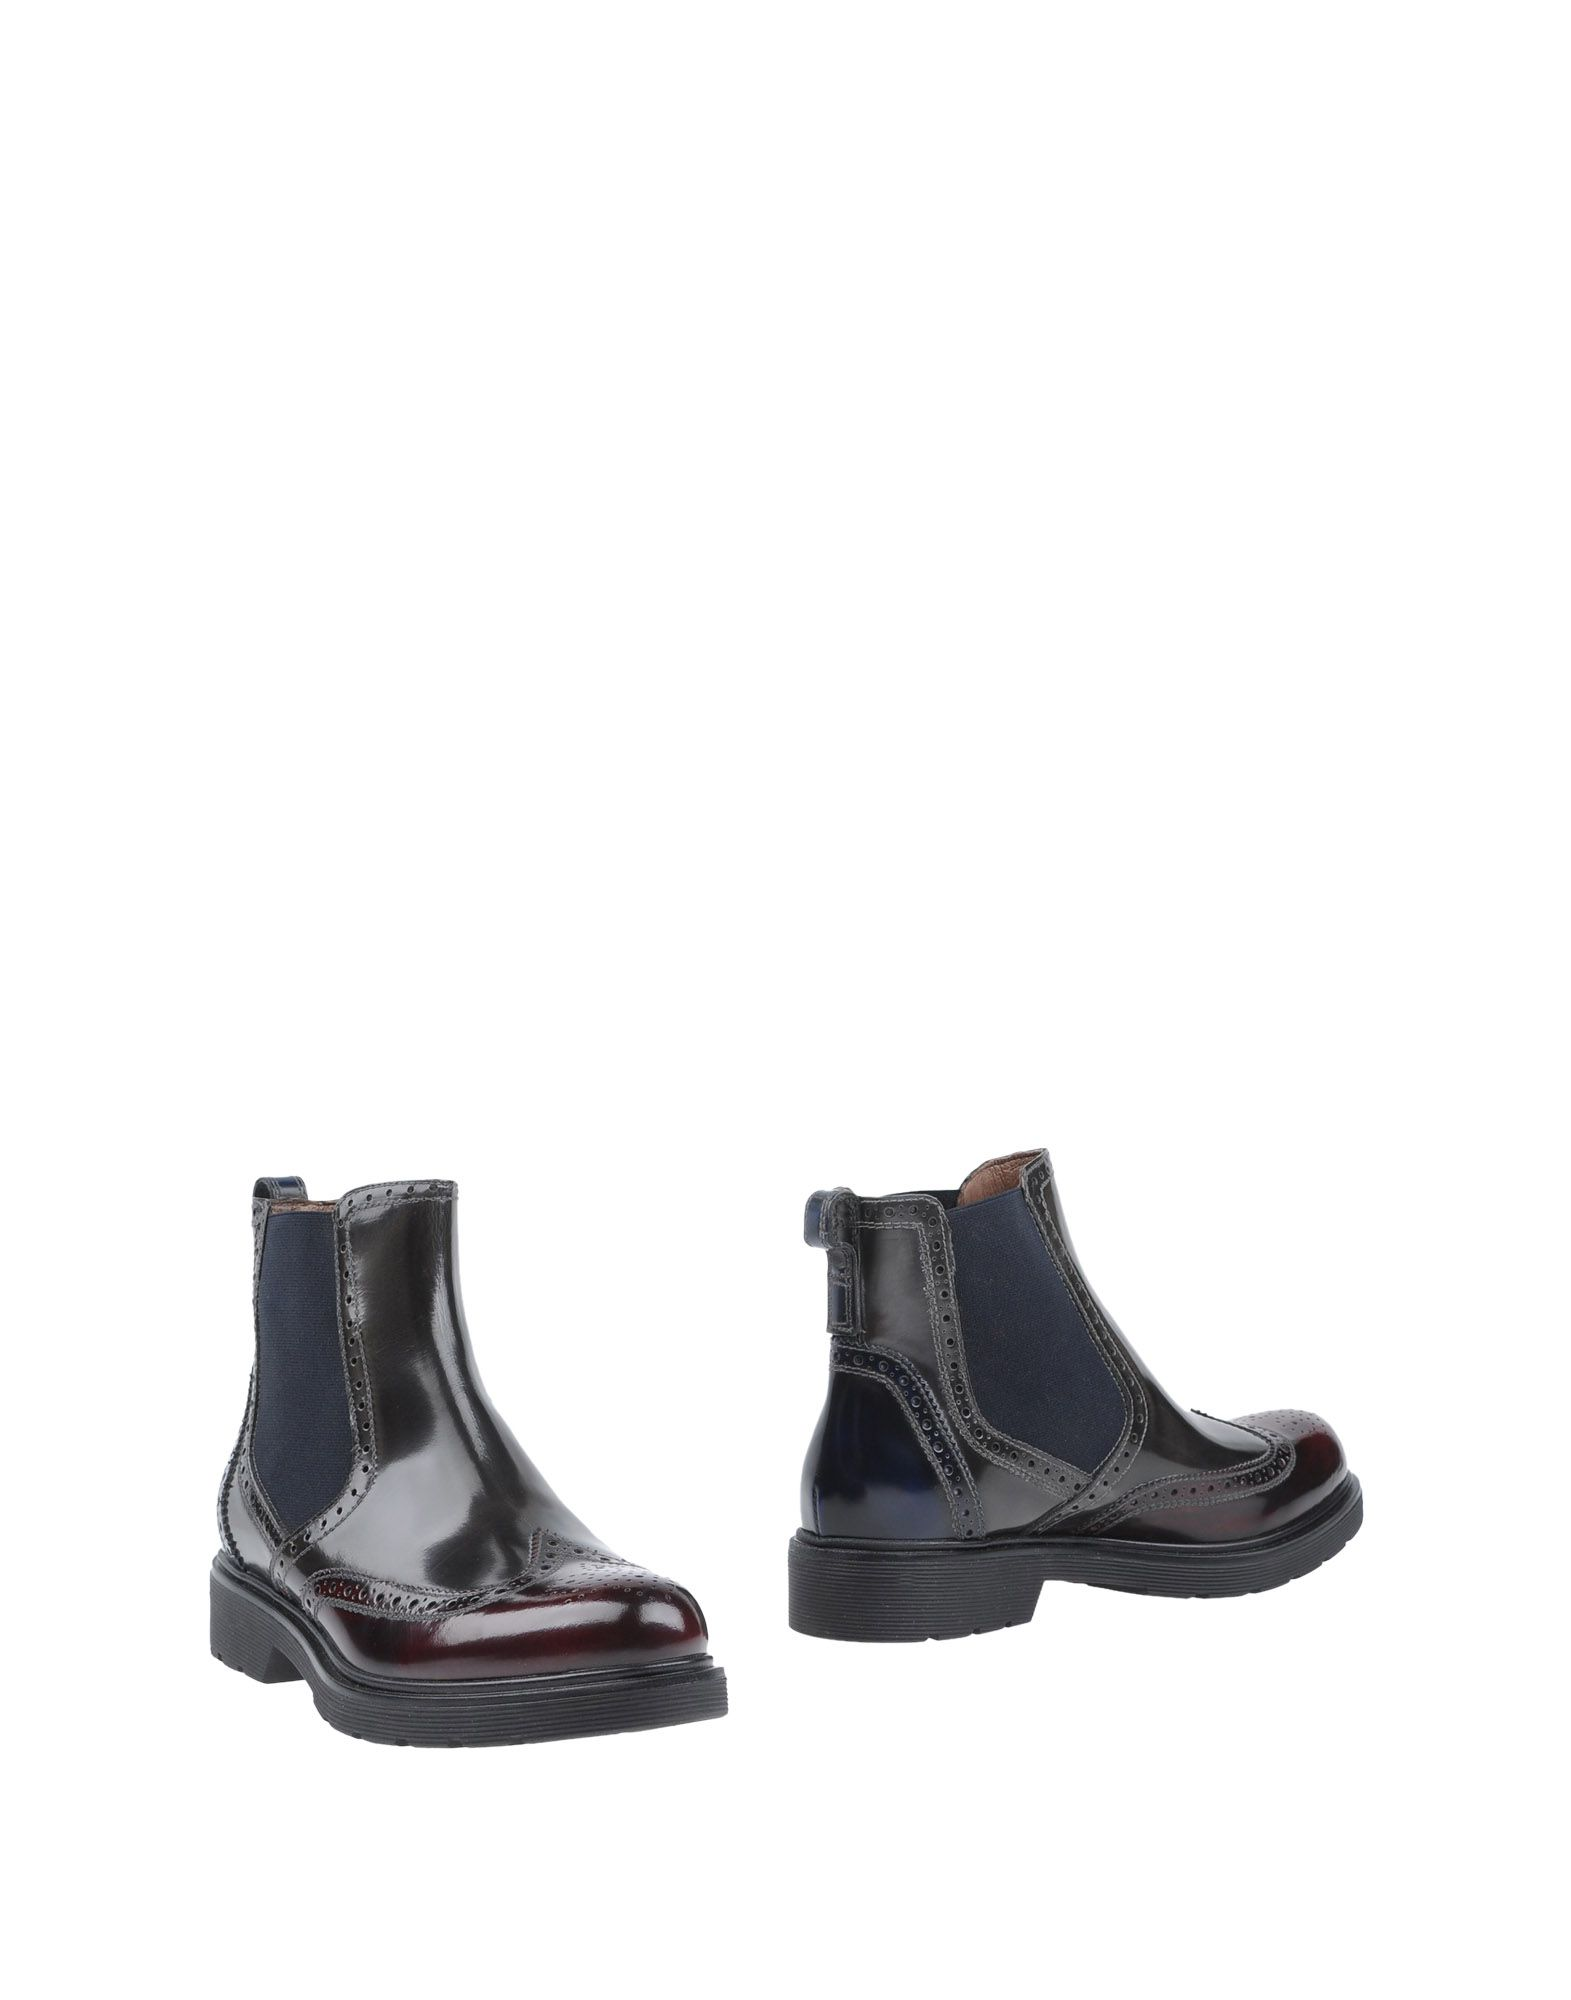 Nero Giardini Chelsea Boots Damen  11297311CT Gute Qualität beliebte Schuhe